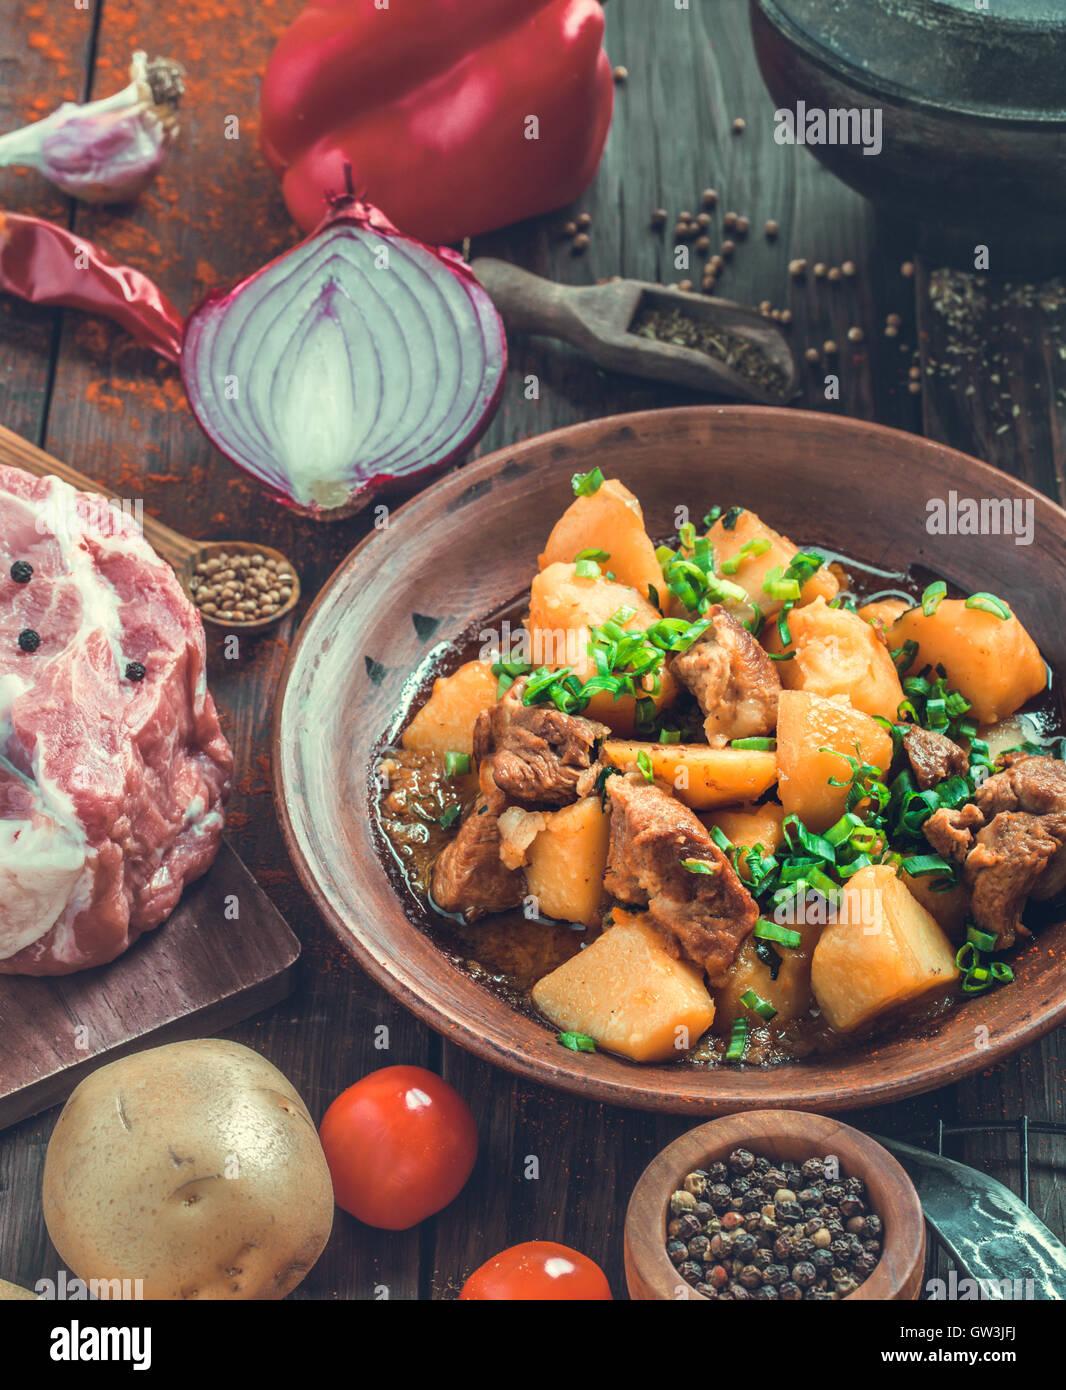 Pork and potato stew rustic style - Stock Image